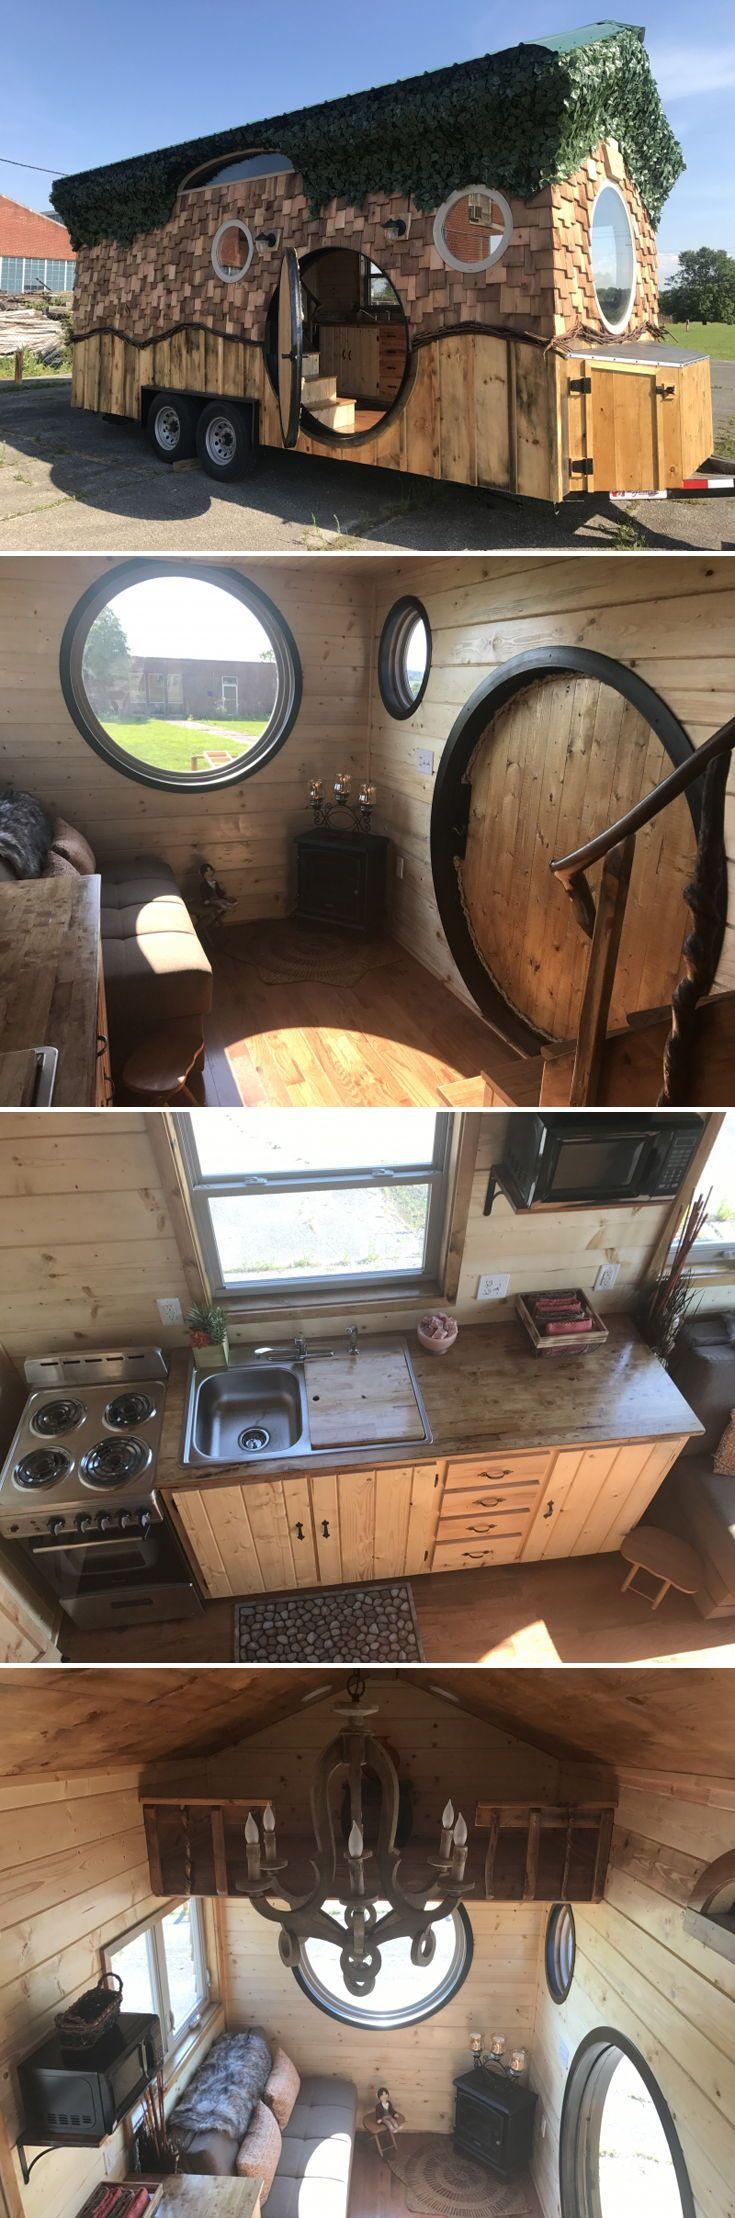 Hobbit Hole By Incredible Tiny Homes Mini Maison Vivre